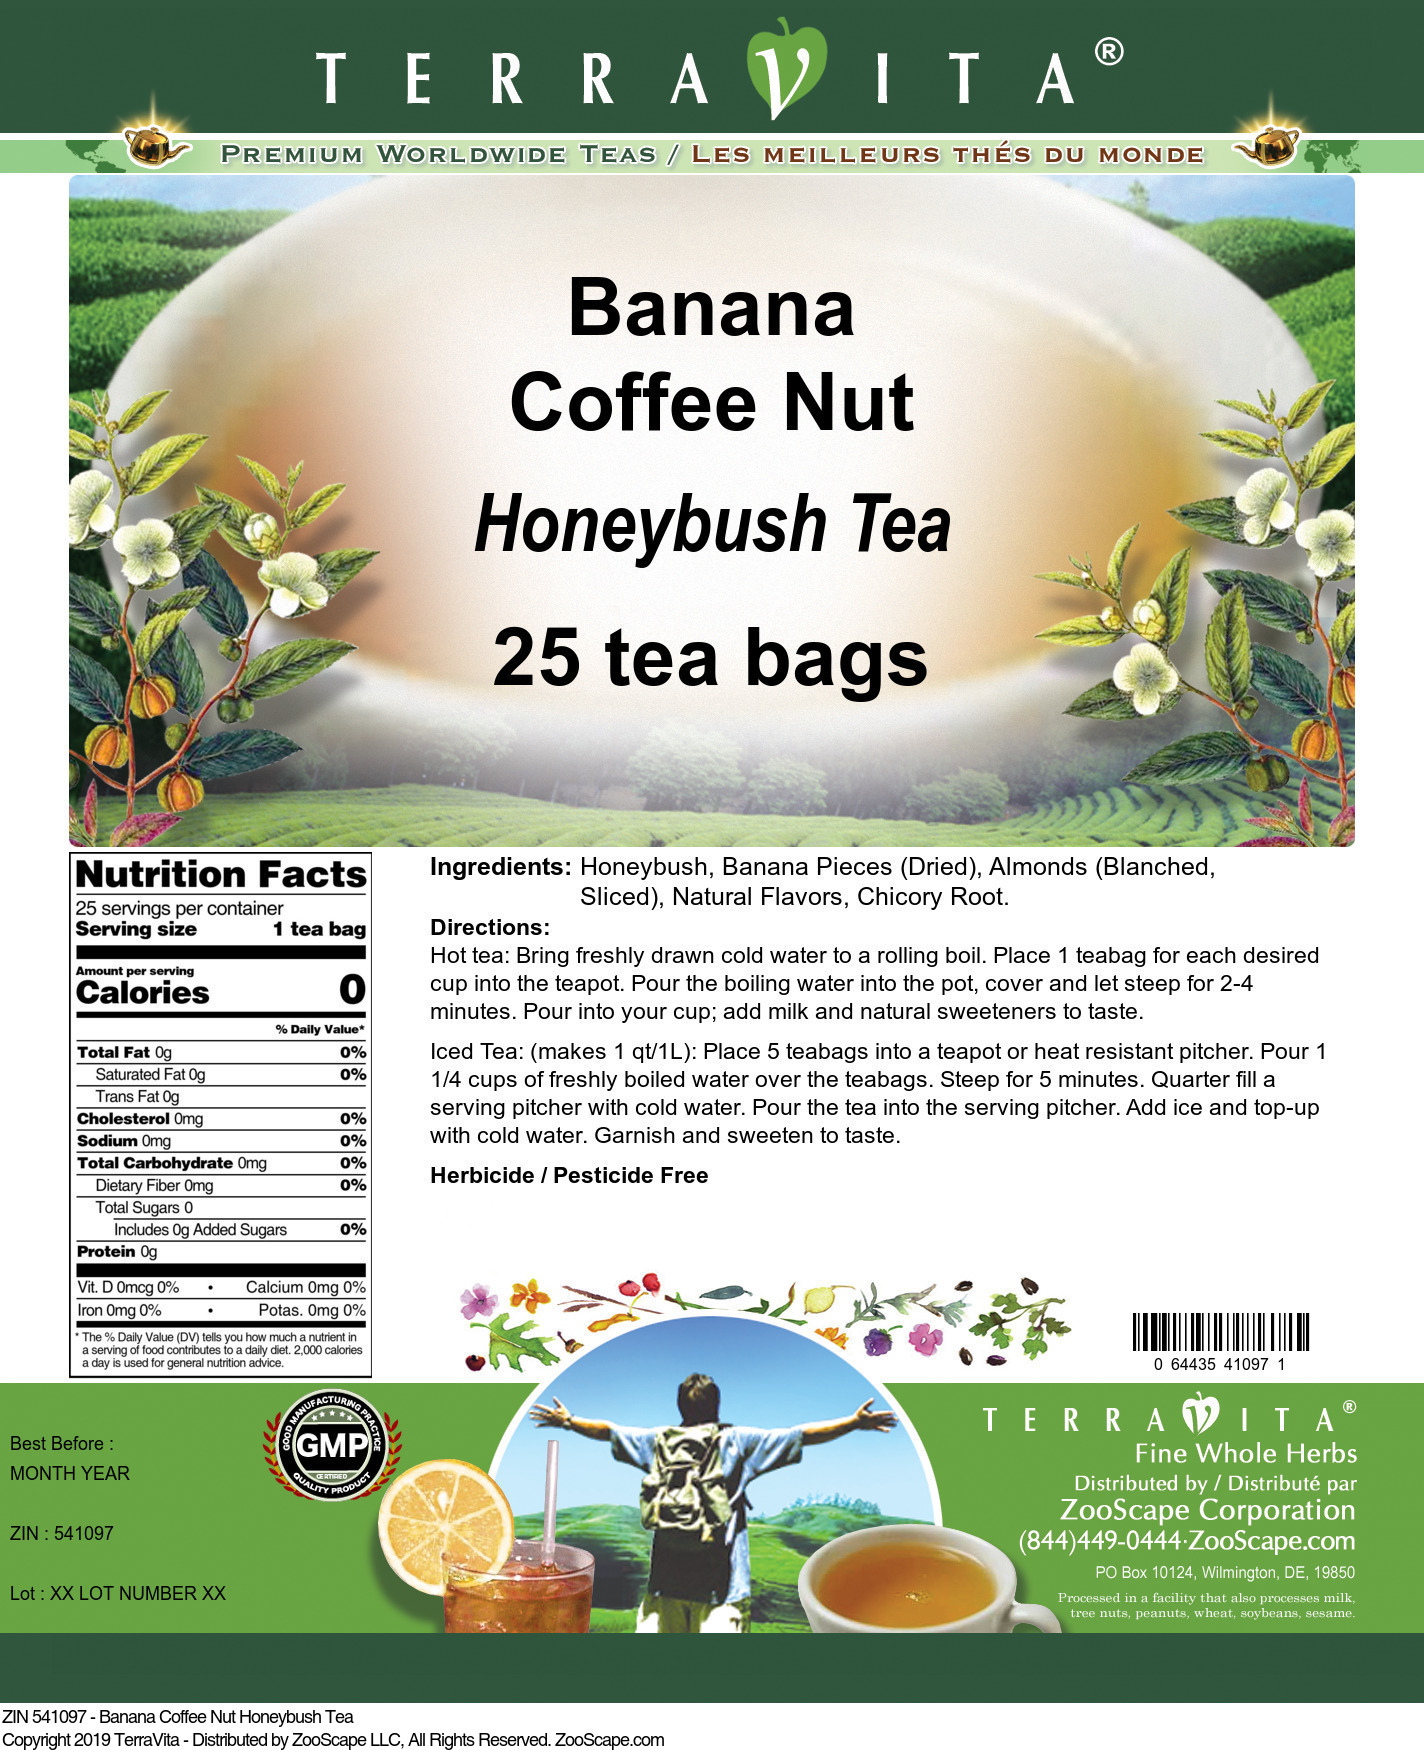 Banana Coffee Nut Honeybush Tea